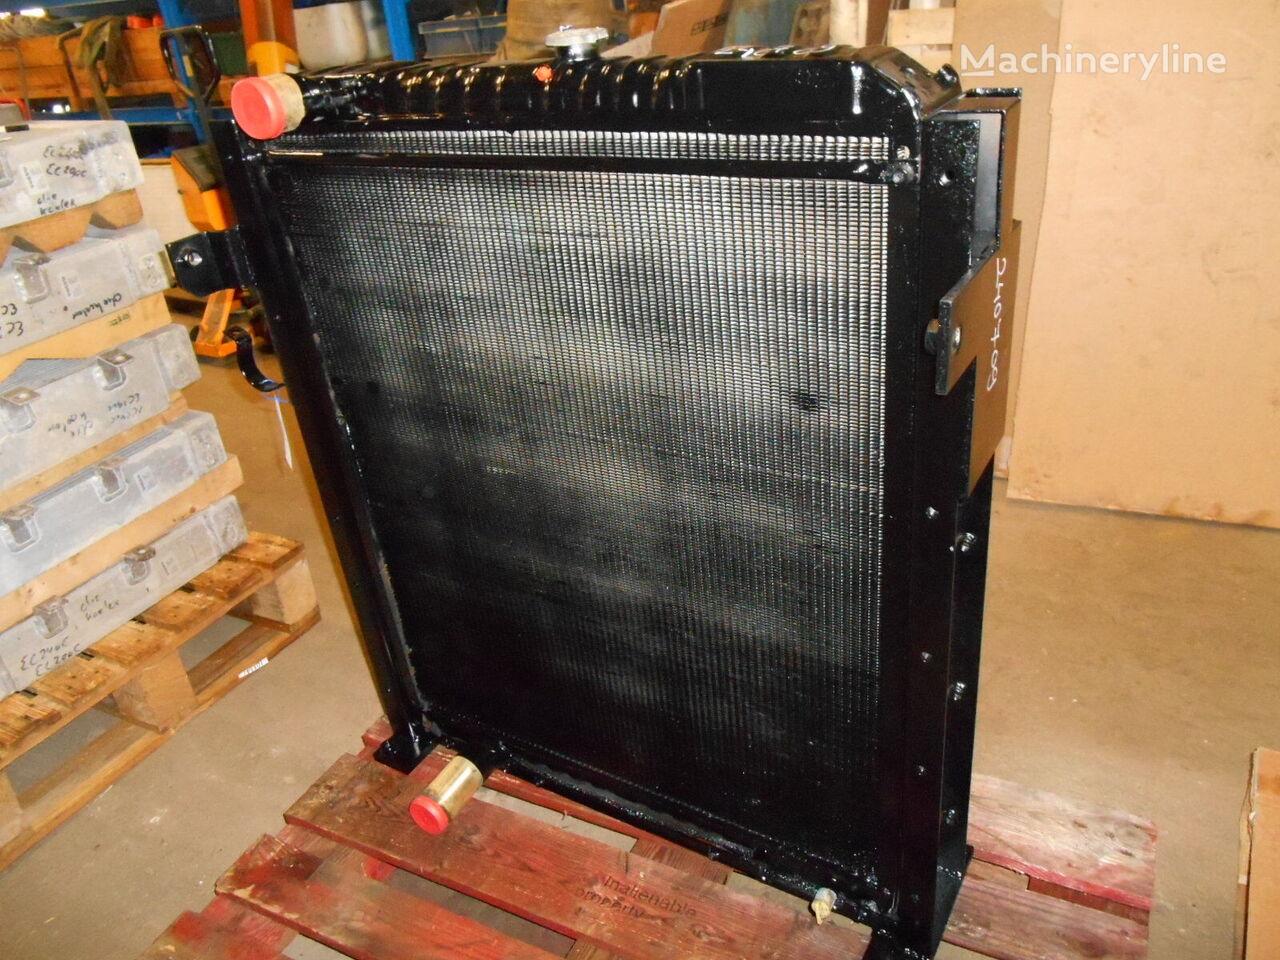 FIAT-HITACHI engine cooling radiator for FIAT-HITACHI FH400-2 excavator